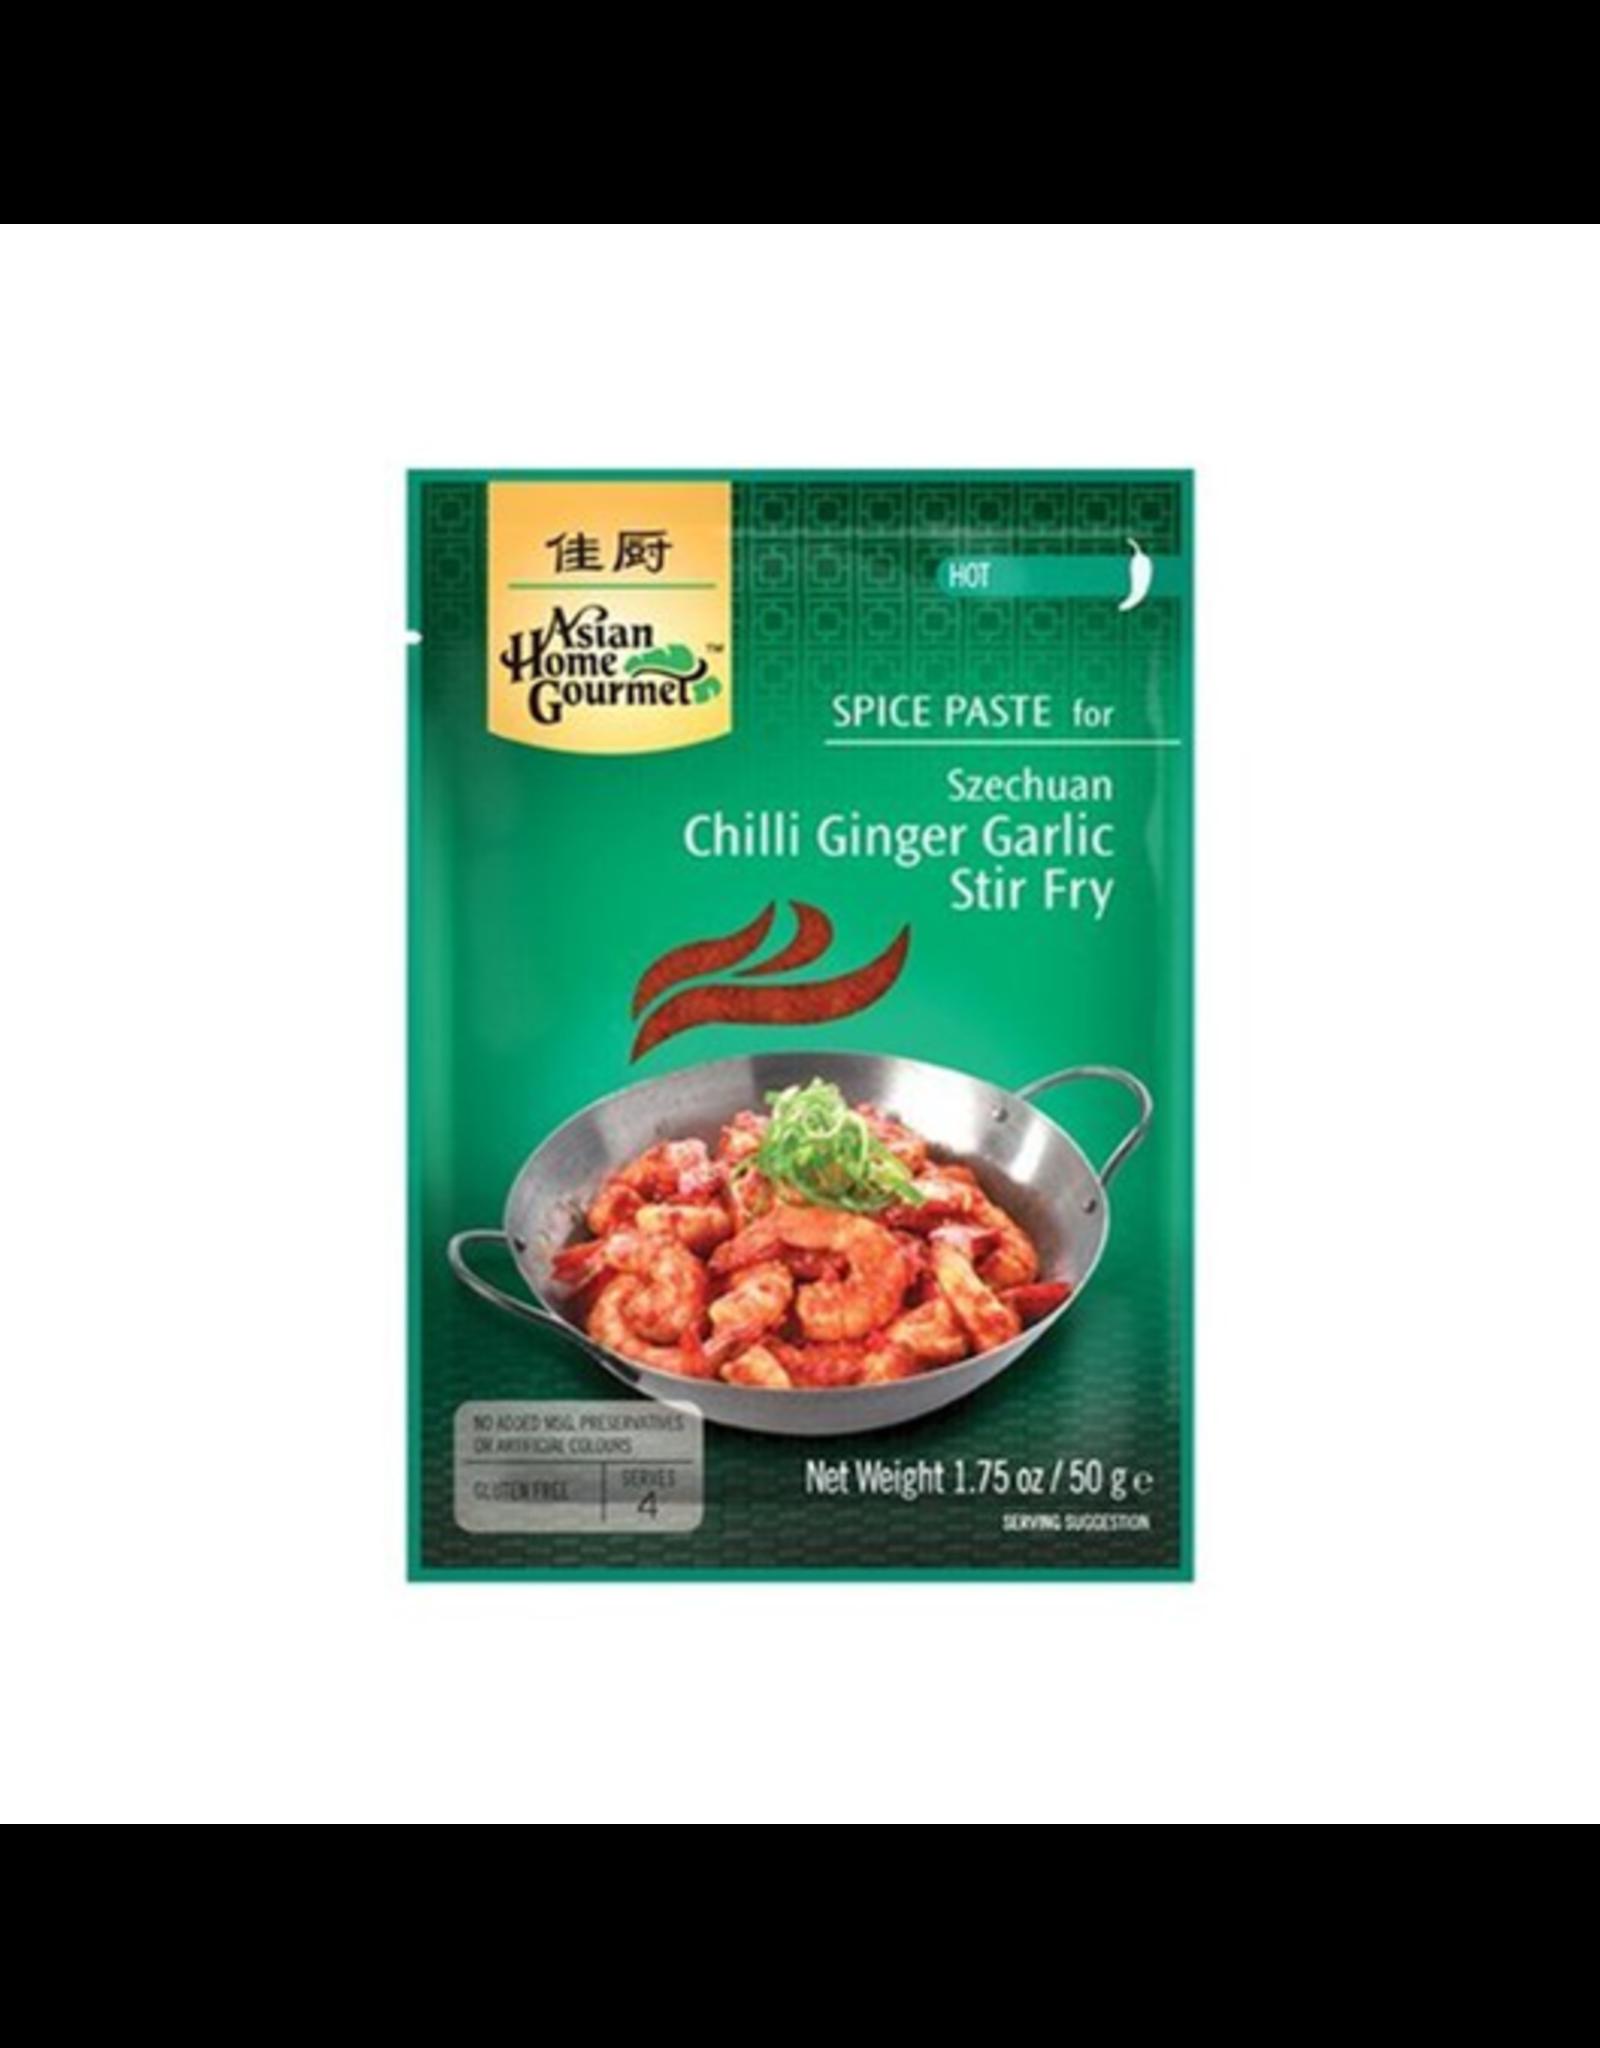 Asian Home Gourmet Cantonese Chili Garlic